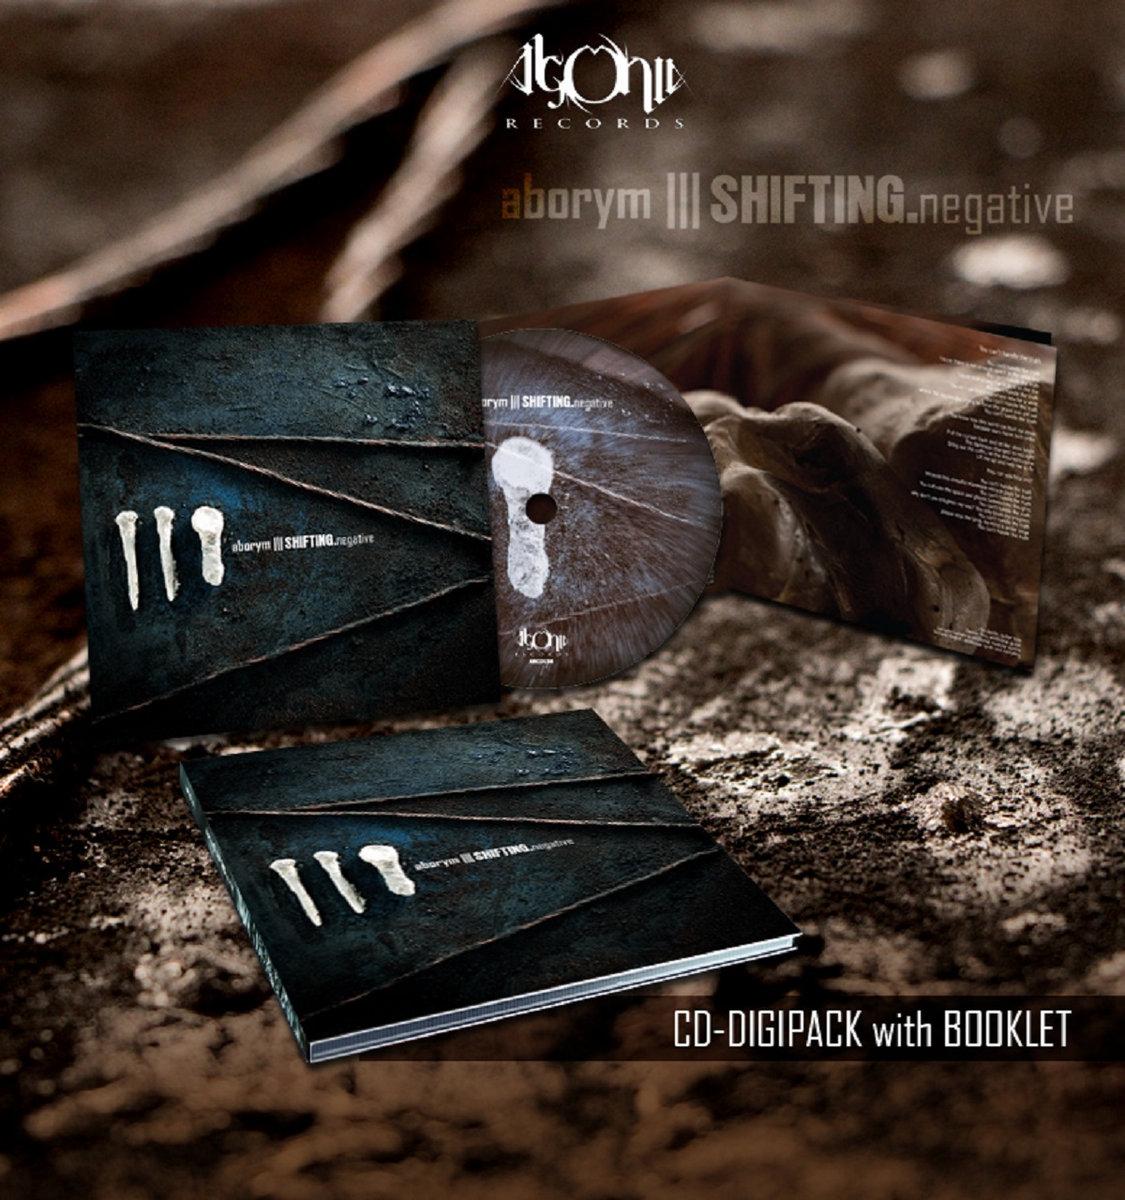 10050 cielo drive | Agonia Records